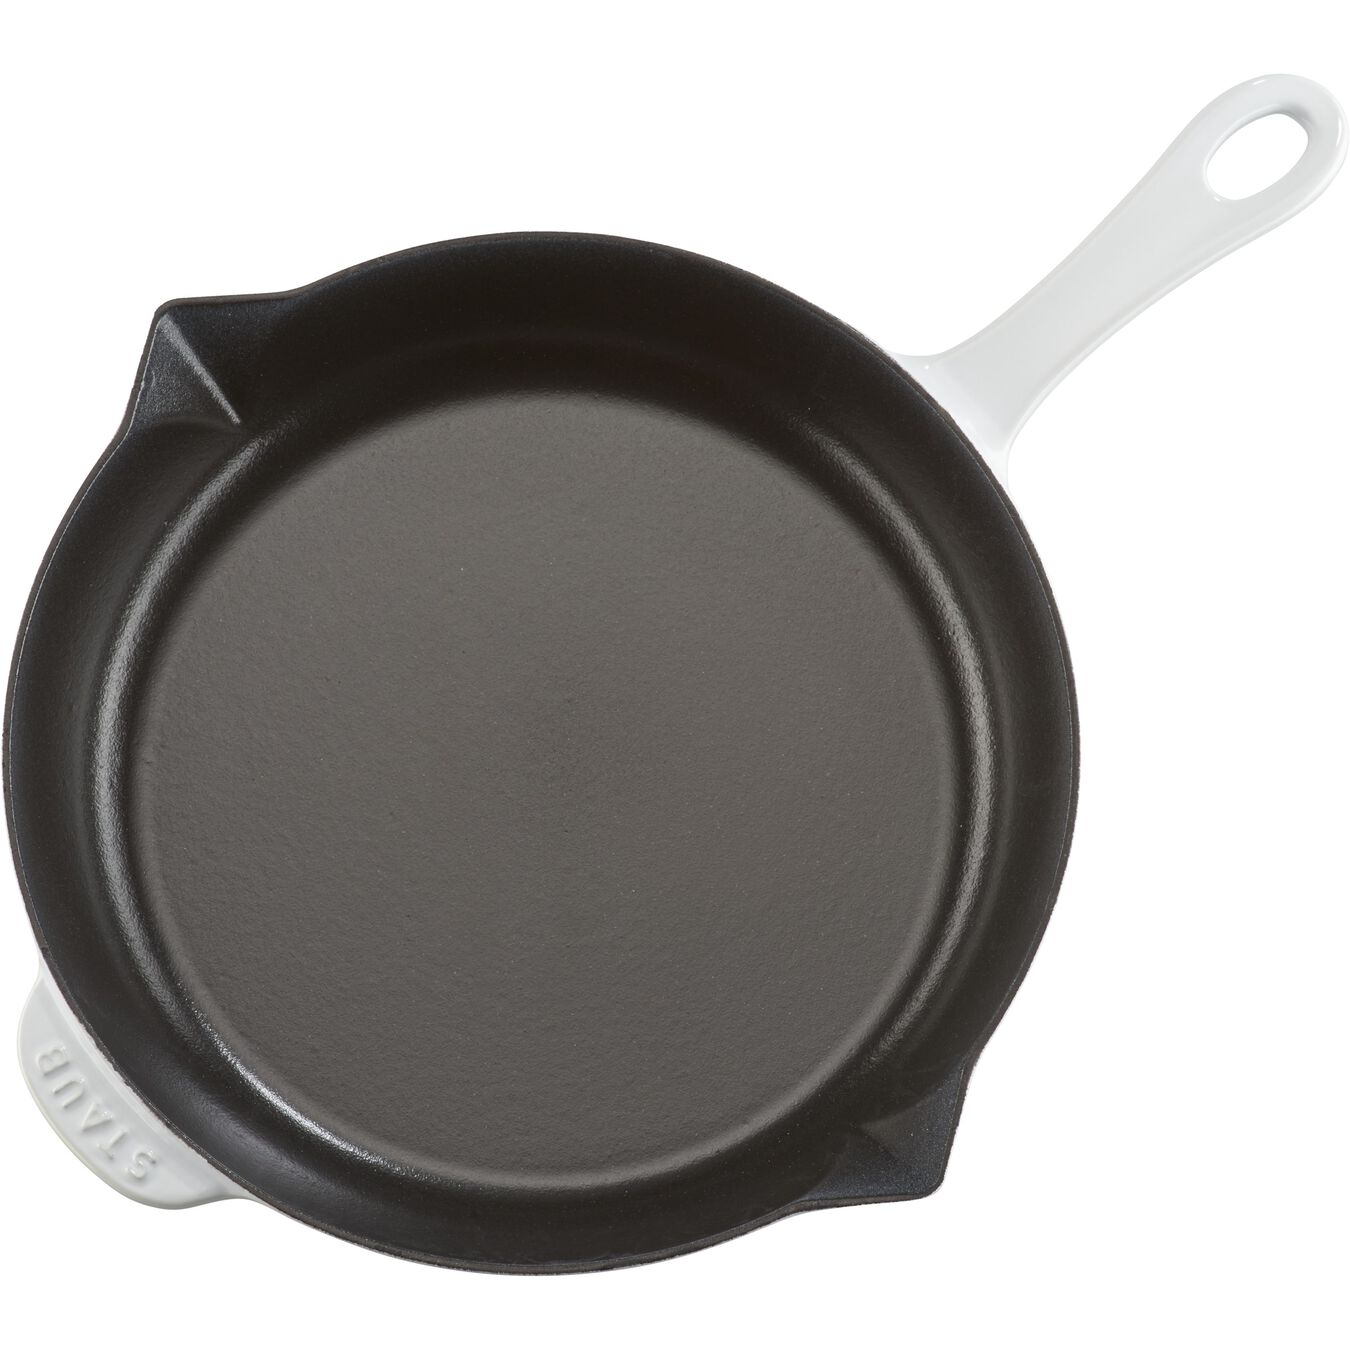 10-inch Fry Pan - White,,large 7